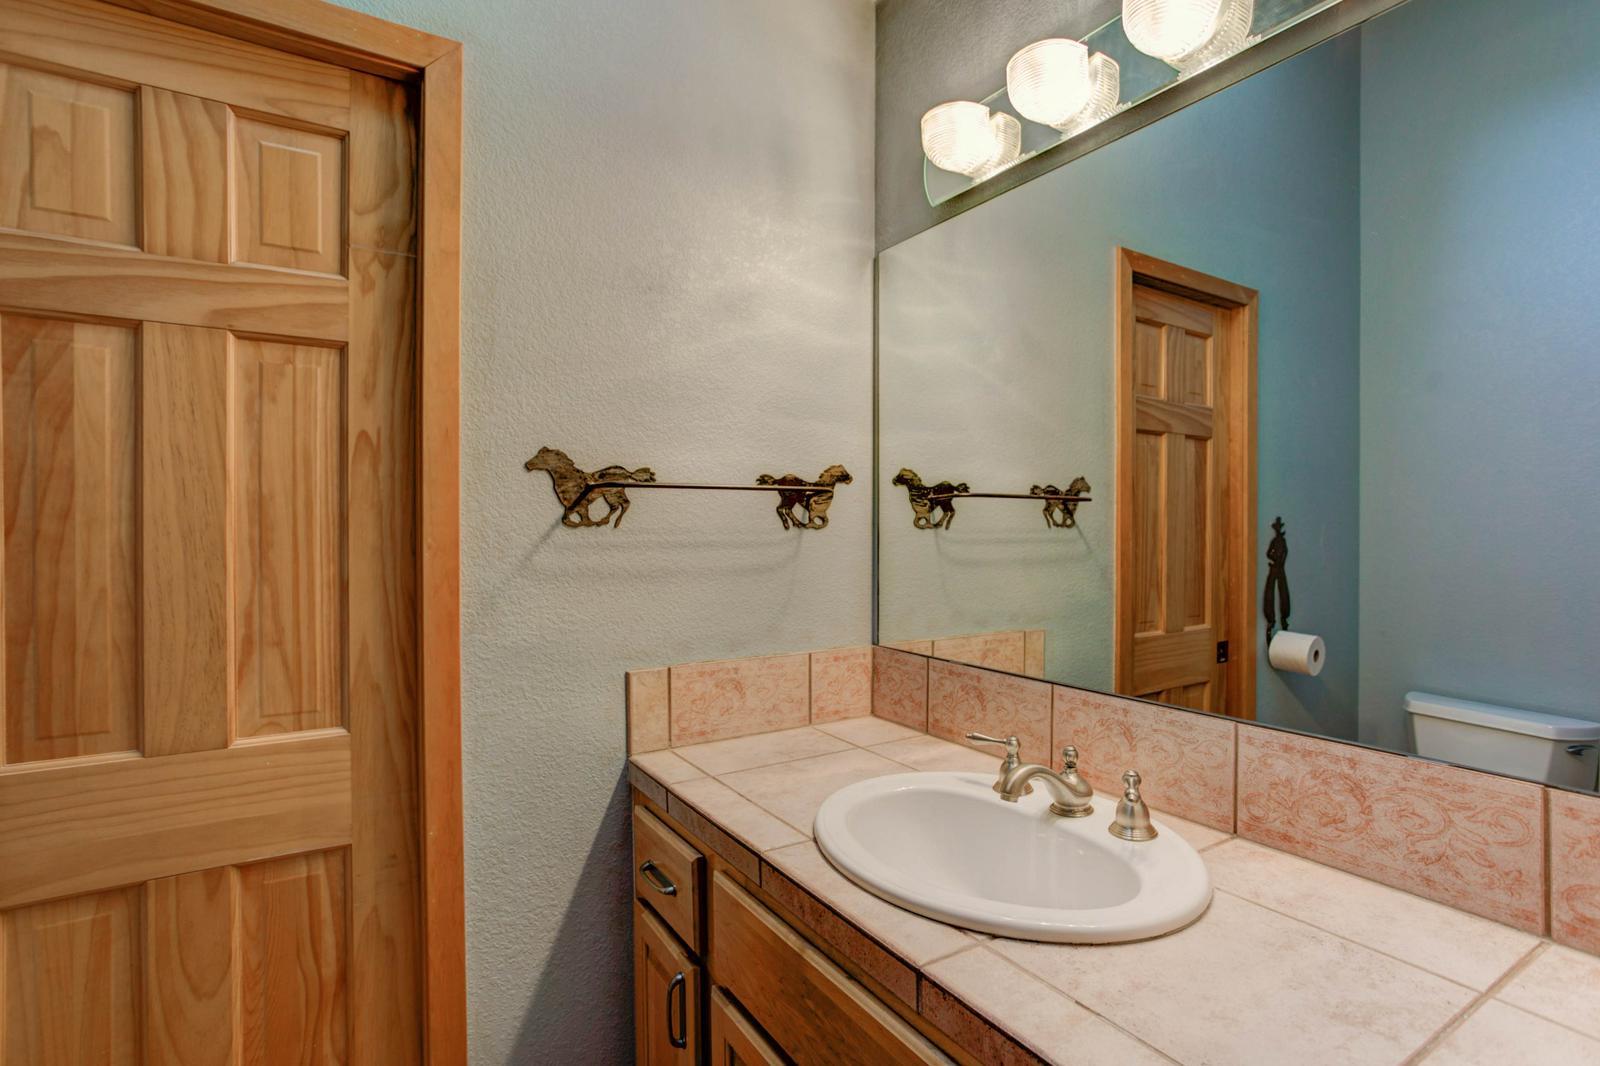 Listassistimage-115861-thumbnail-1572%2bsugarbush%2bdrive_bathroom02-1600x1600